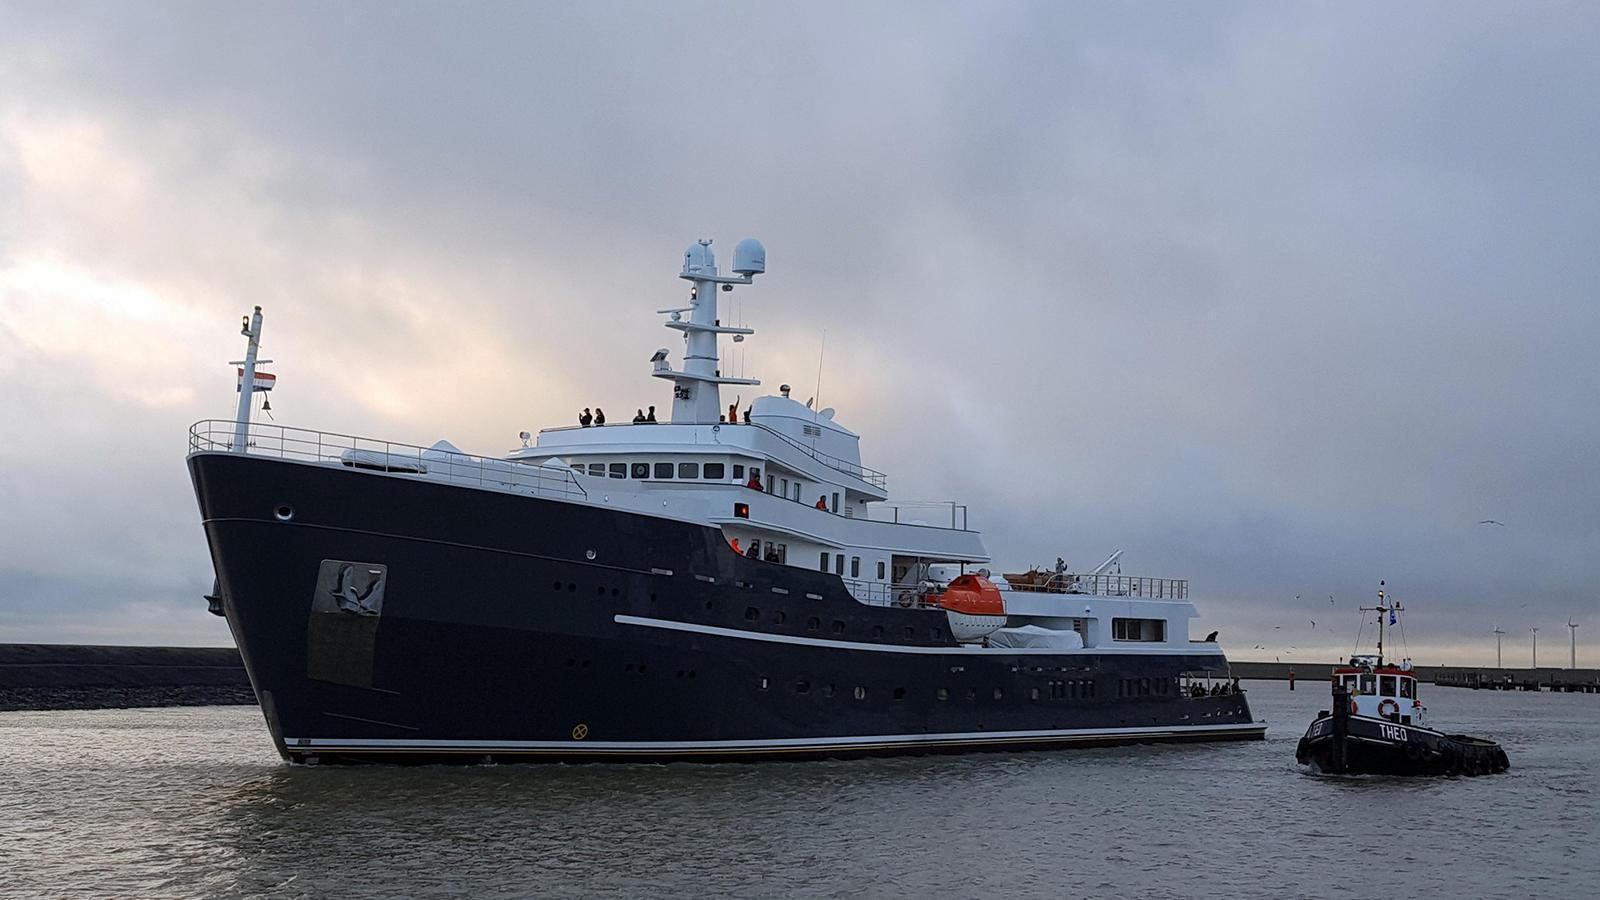 legend-motor-yacht-ihc-verschure-1974-77m-profile-post-refit